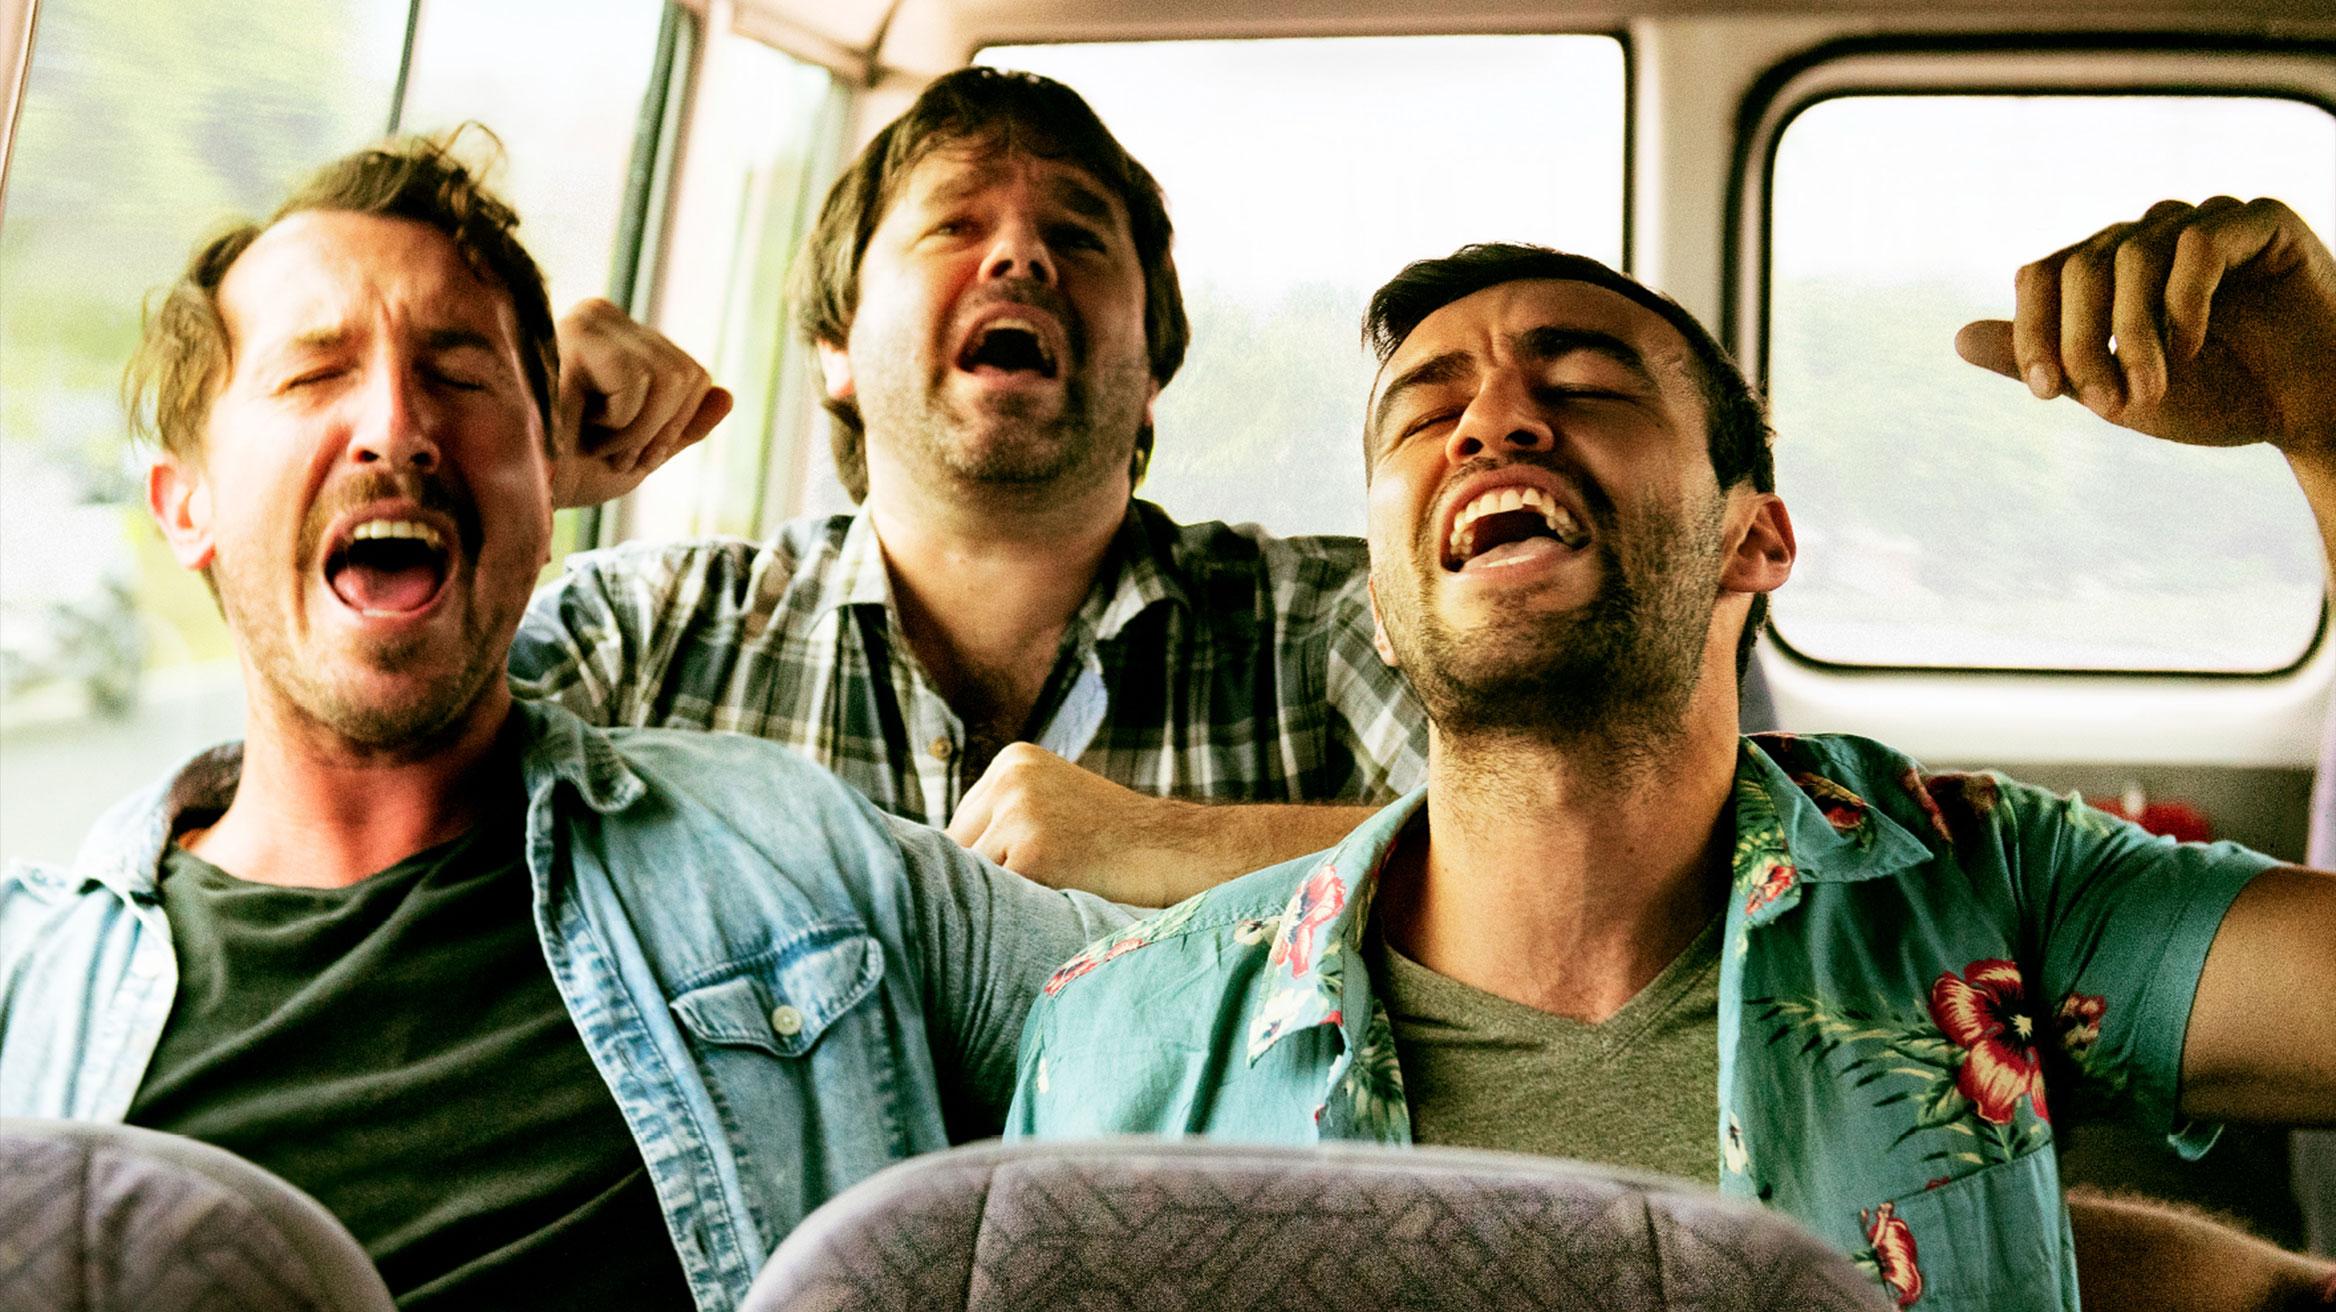 Group of young men singing in a van